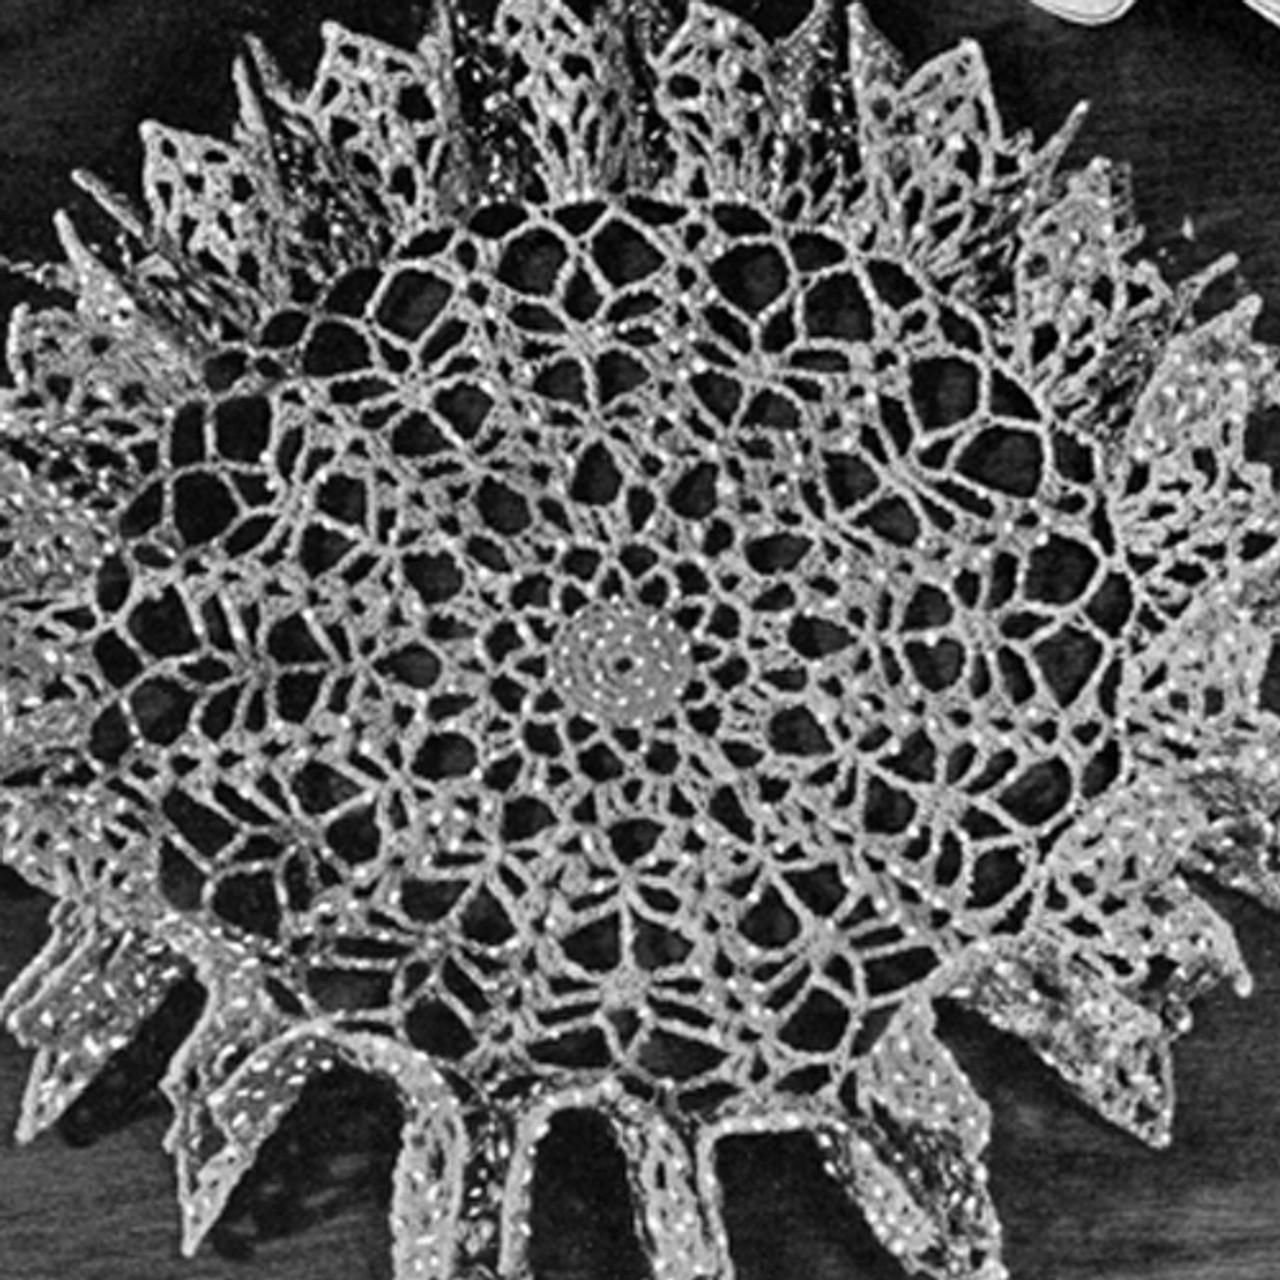 Vintage Crochet Pattern for Ruffled Star Spangled Doily